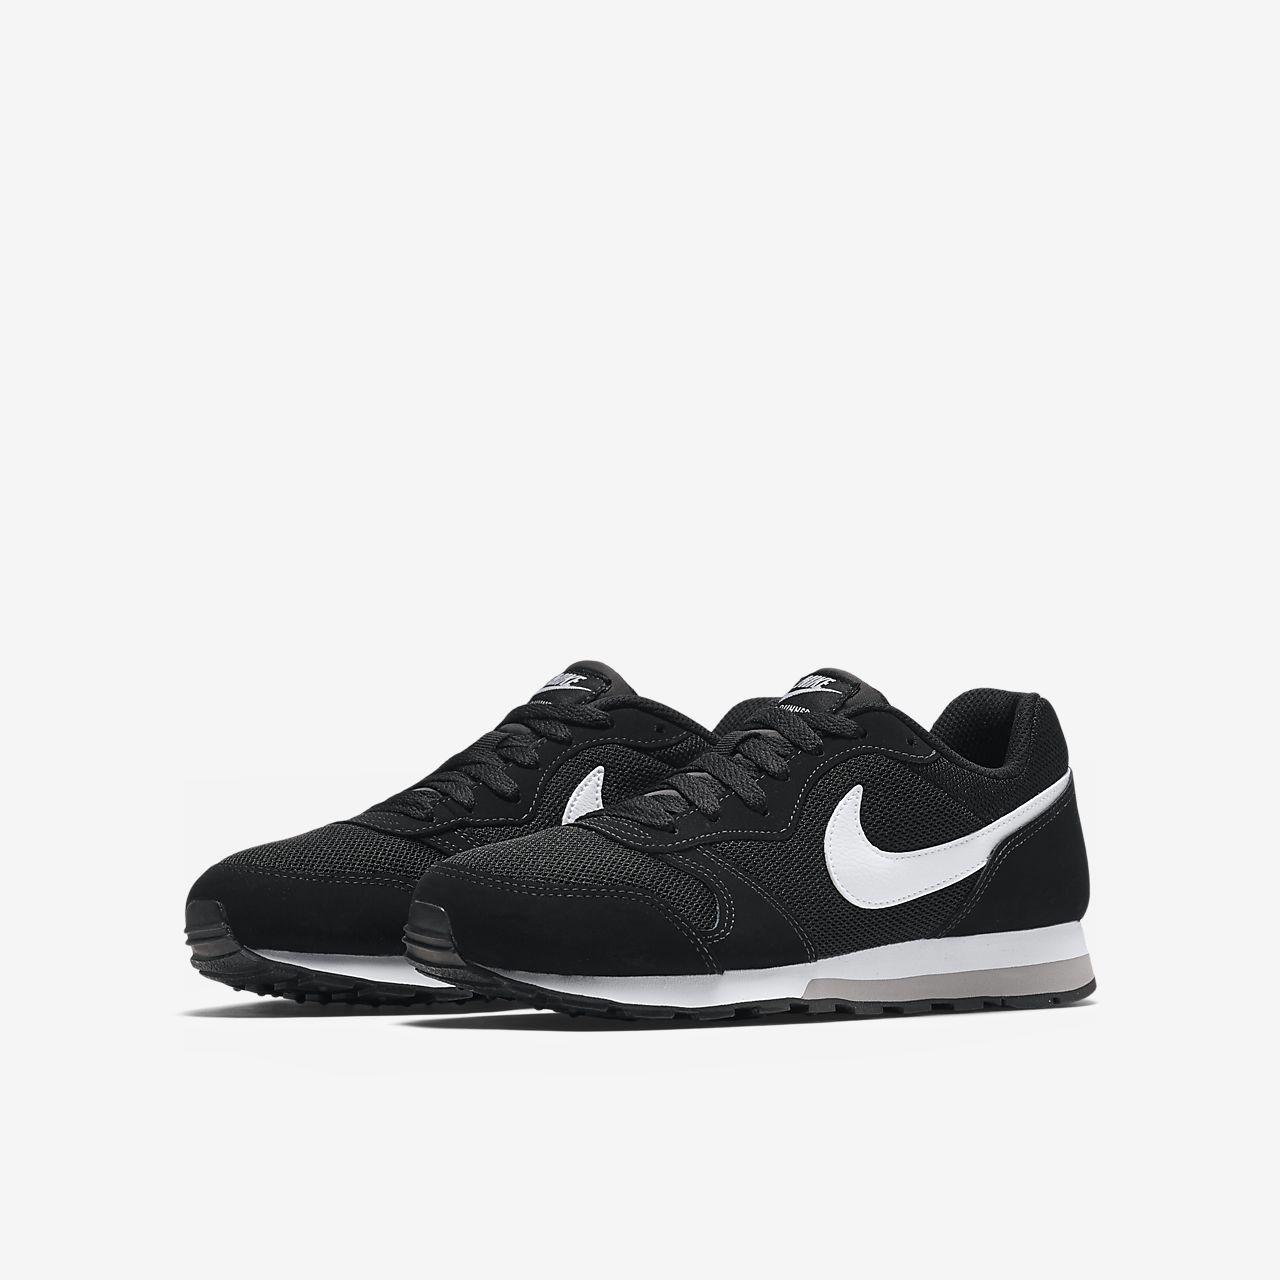 newest 7953c aeaaf ... Sko Nike MD Runner 2 för ungdom